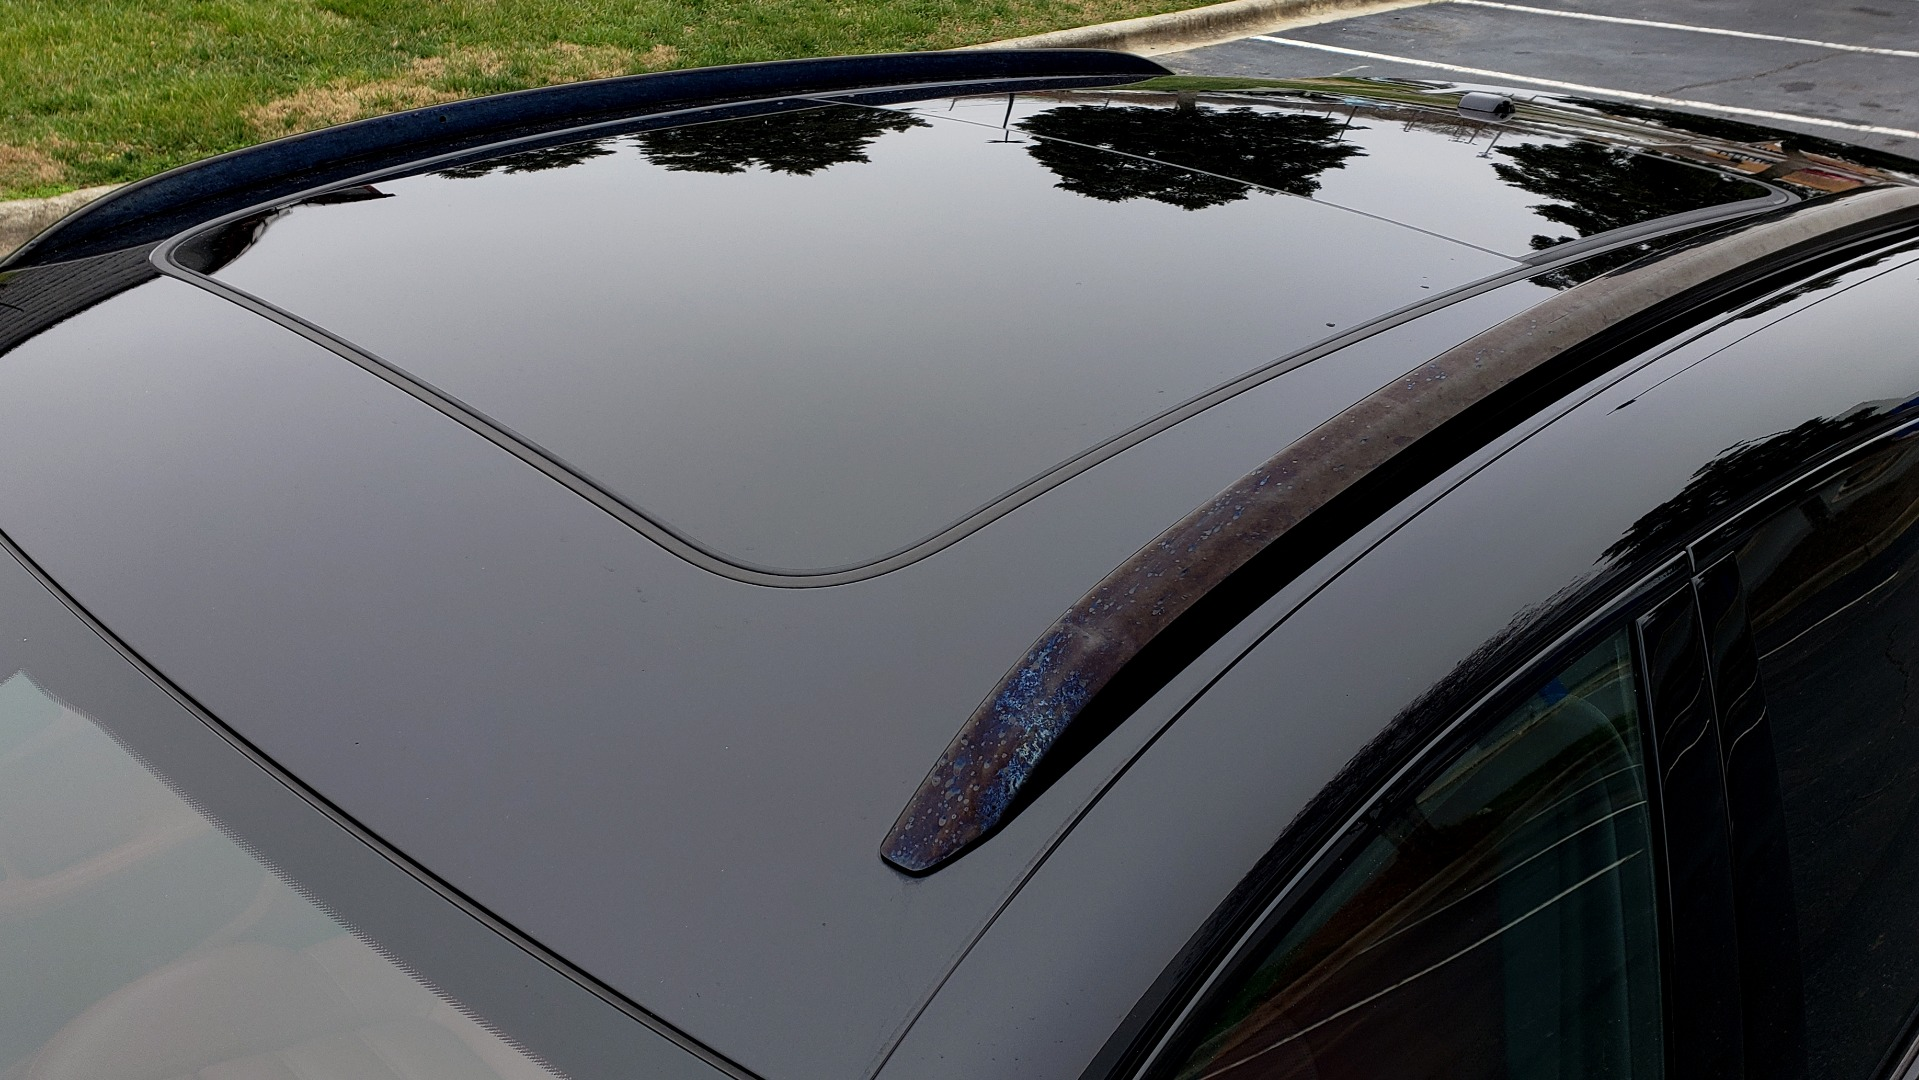 Used 2016 Porsche MACAN TURBO / PREM / NAV / PARK ASST / BOSE / PDK / CHRONO PKG for sale Sold at Formula Imports in Charlotte NC 28227 8